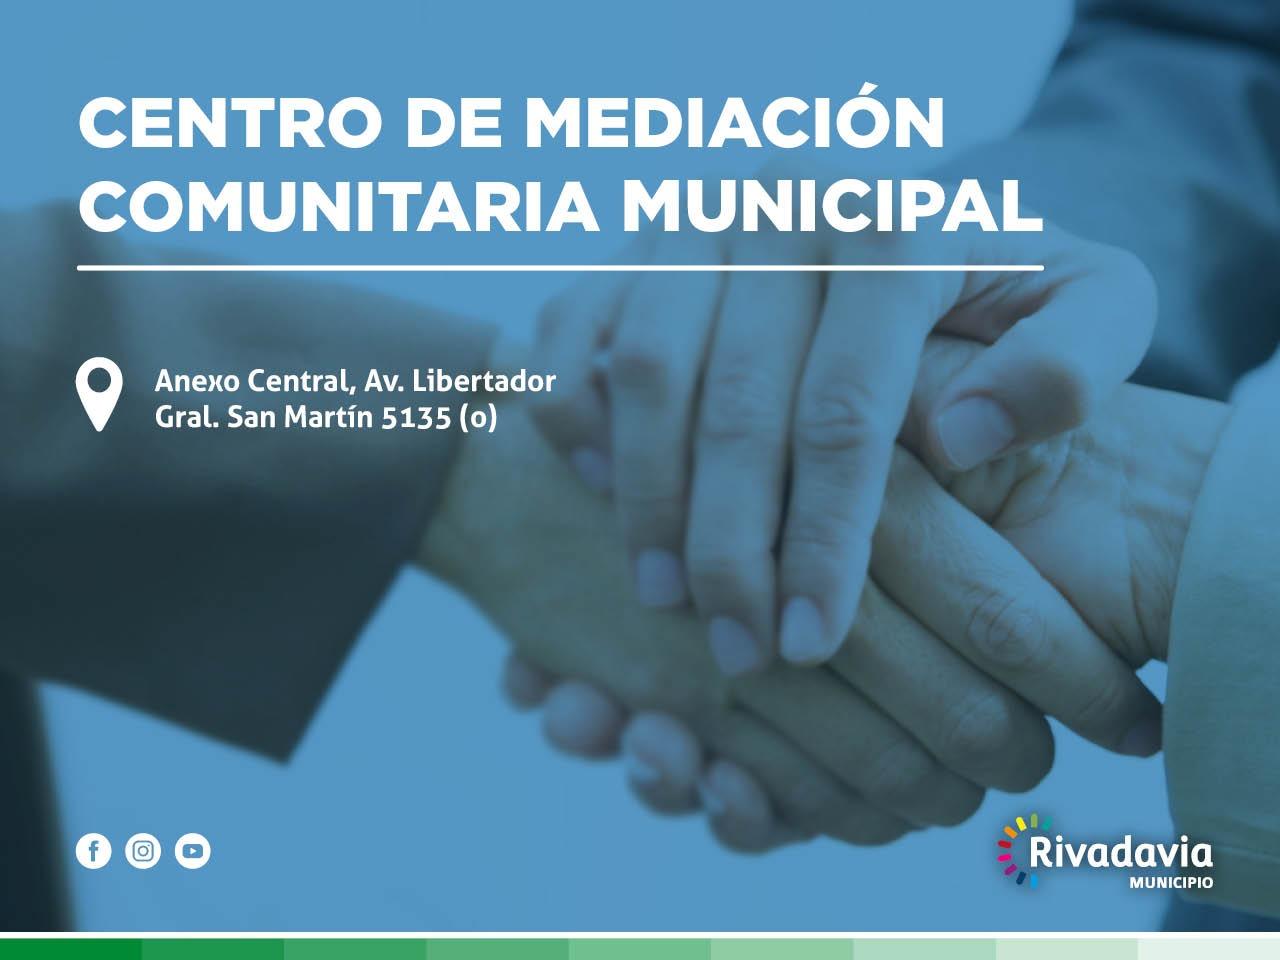 MEDIACION COMUNITARIA MUNICIPAL